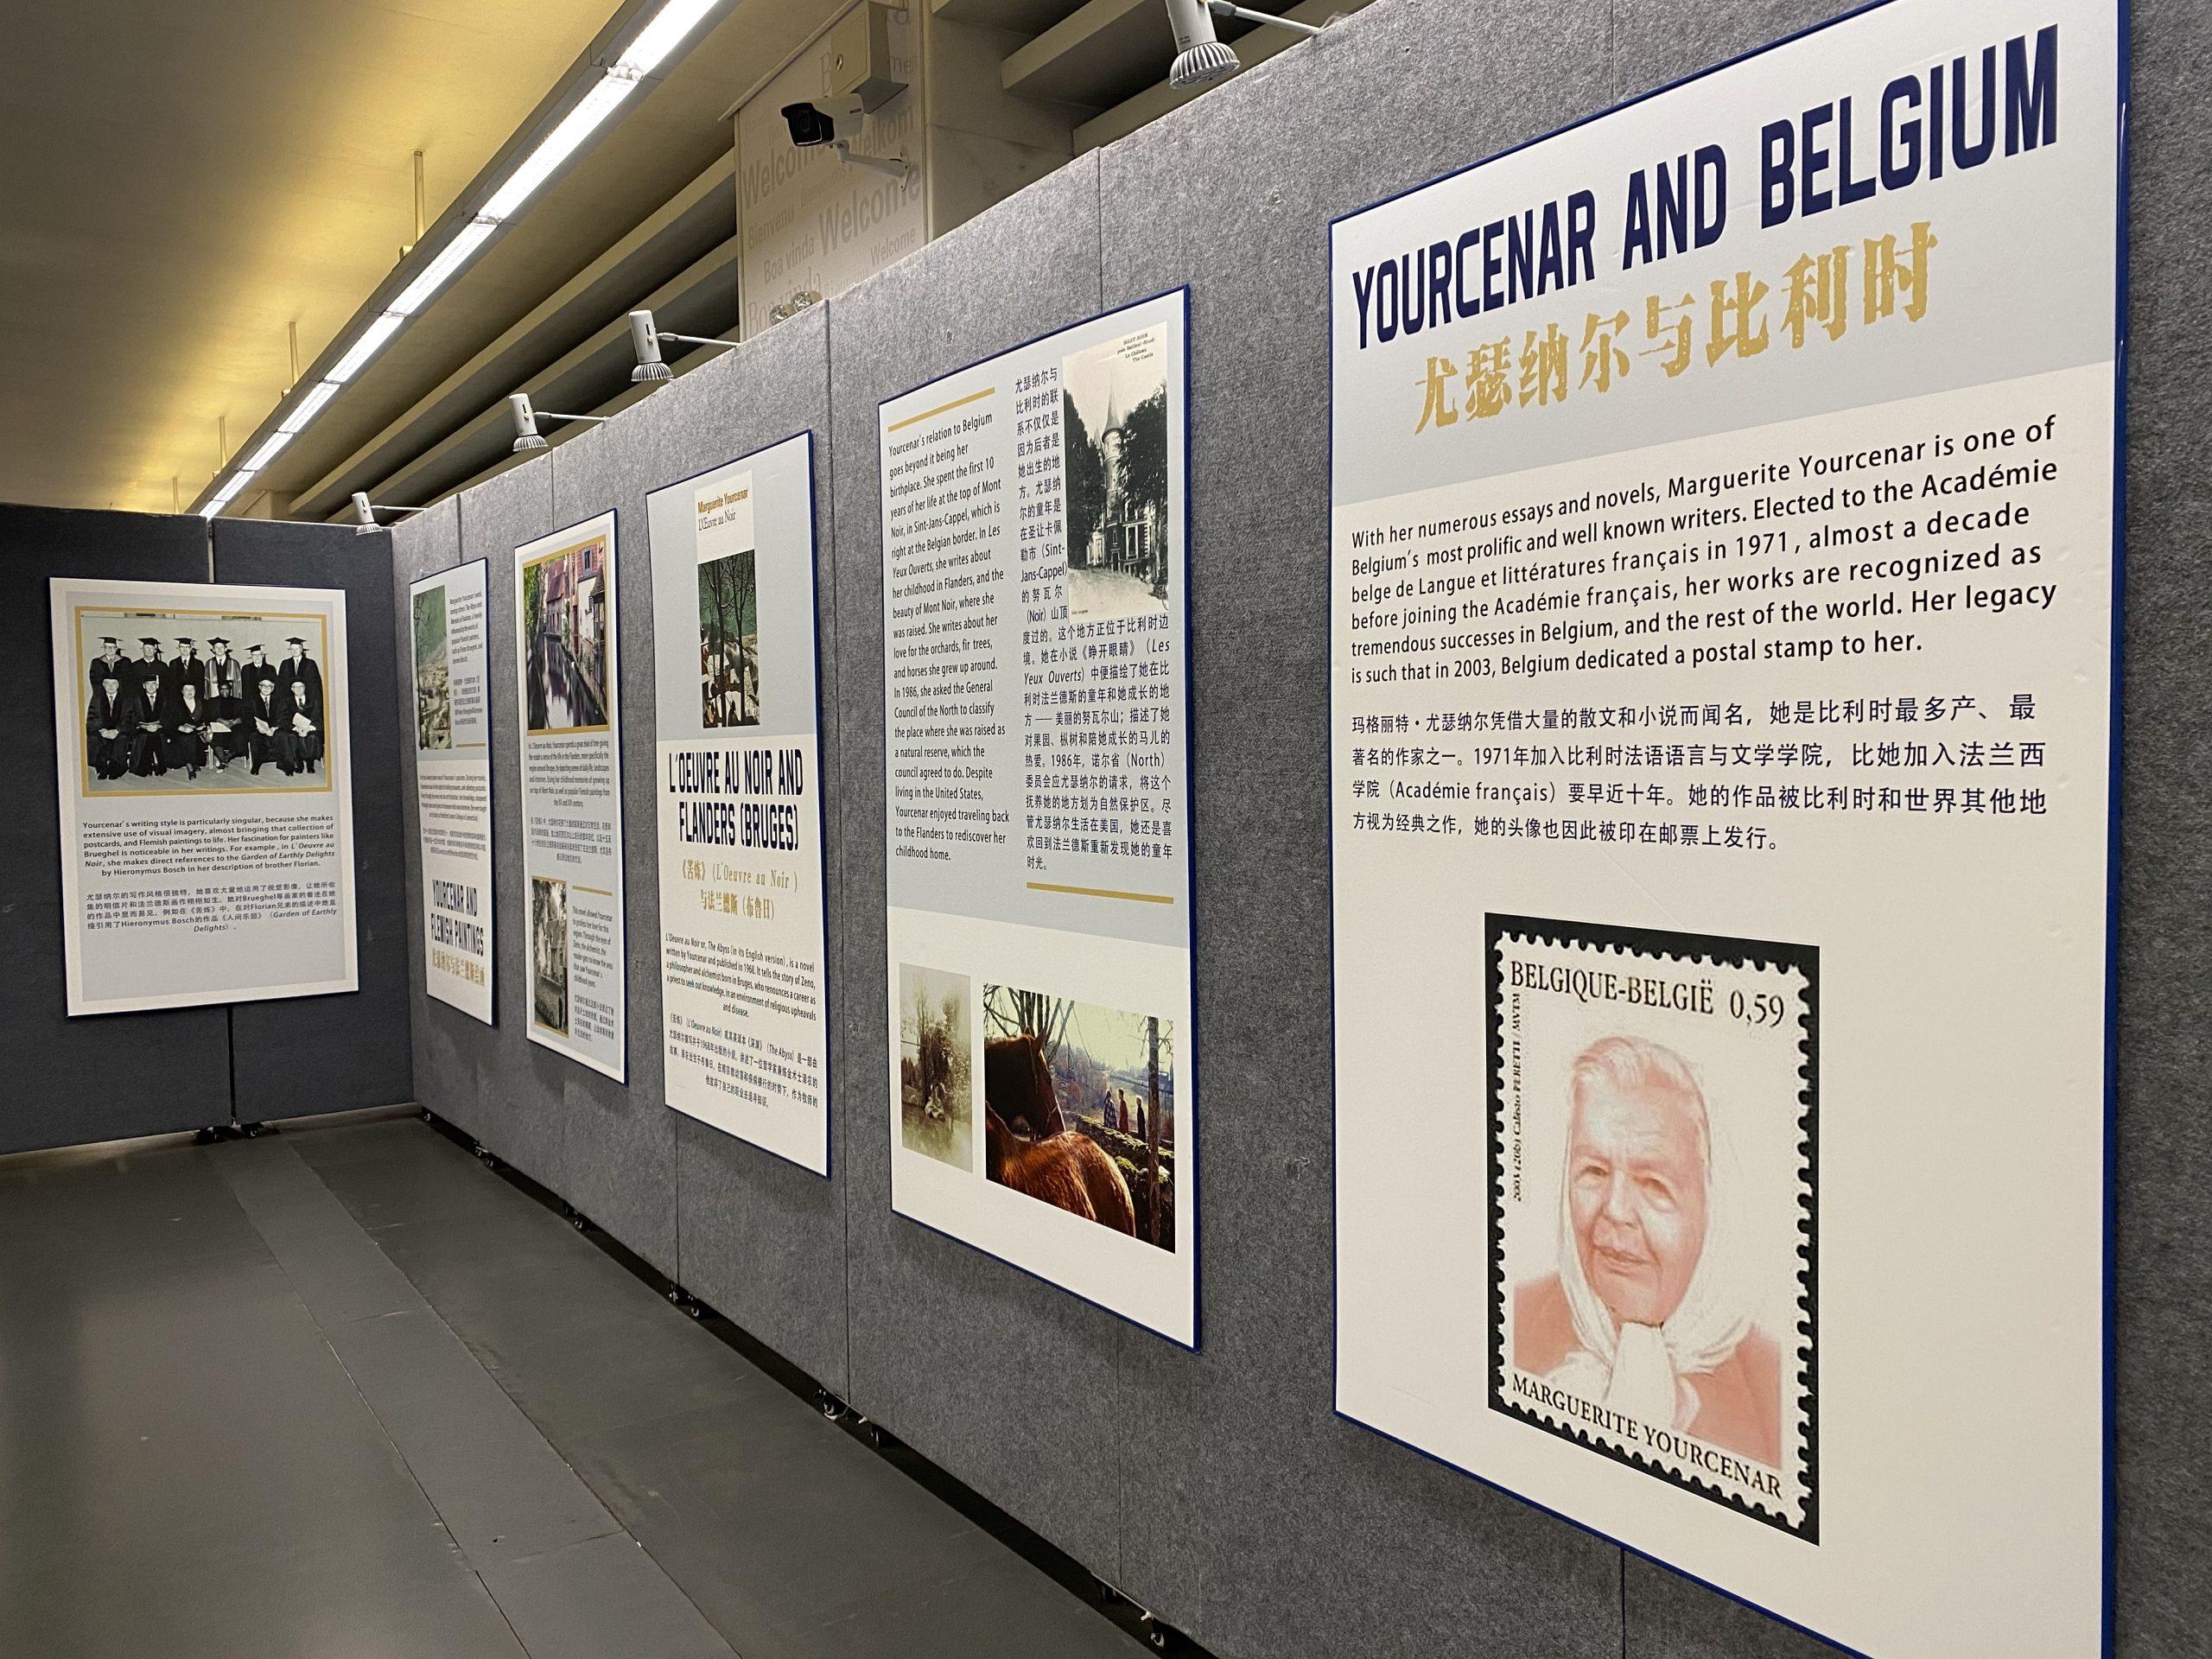 "展览信息:""玛格丽特·尤瑟纳尔与比利时"" | Exhibition Info: ""Marguerite Yourcenar and Belgium"""